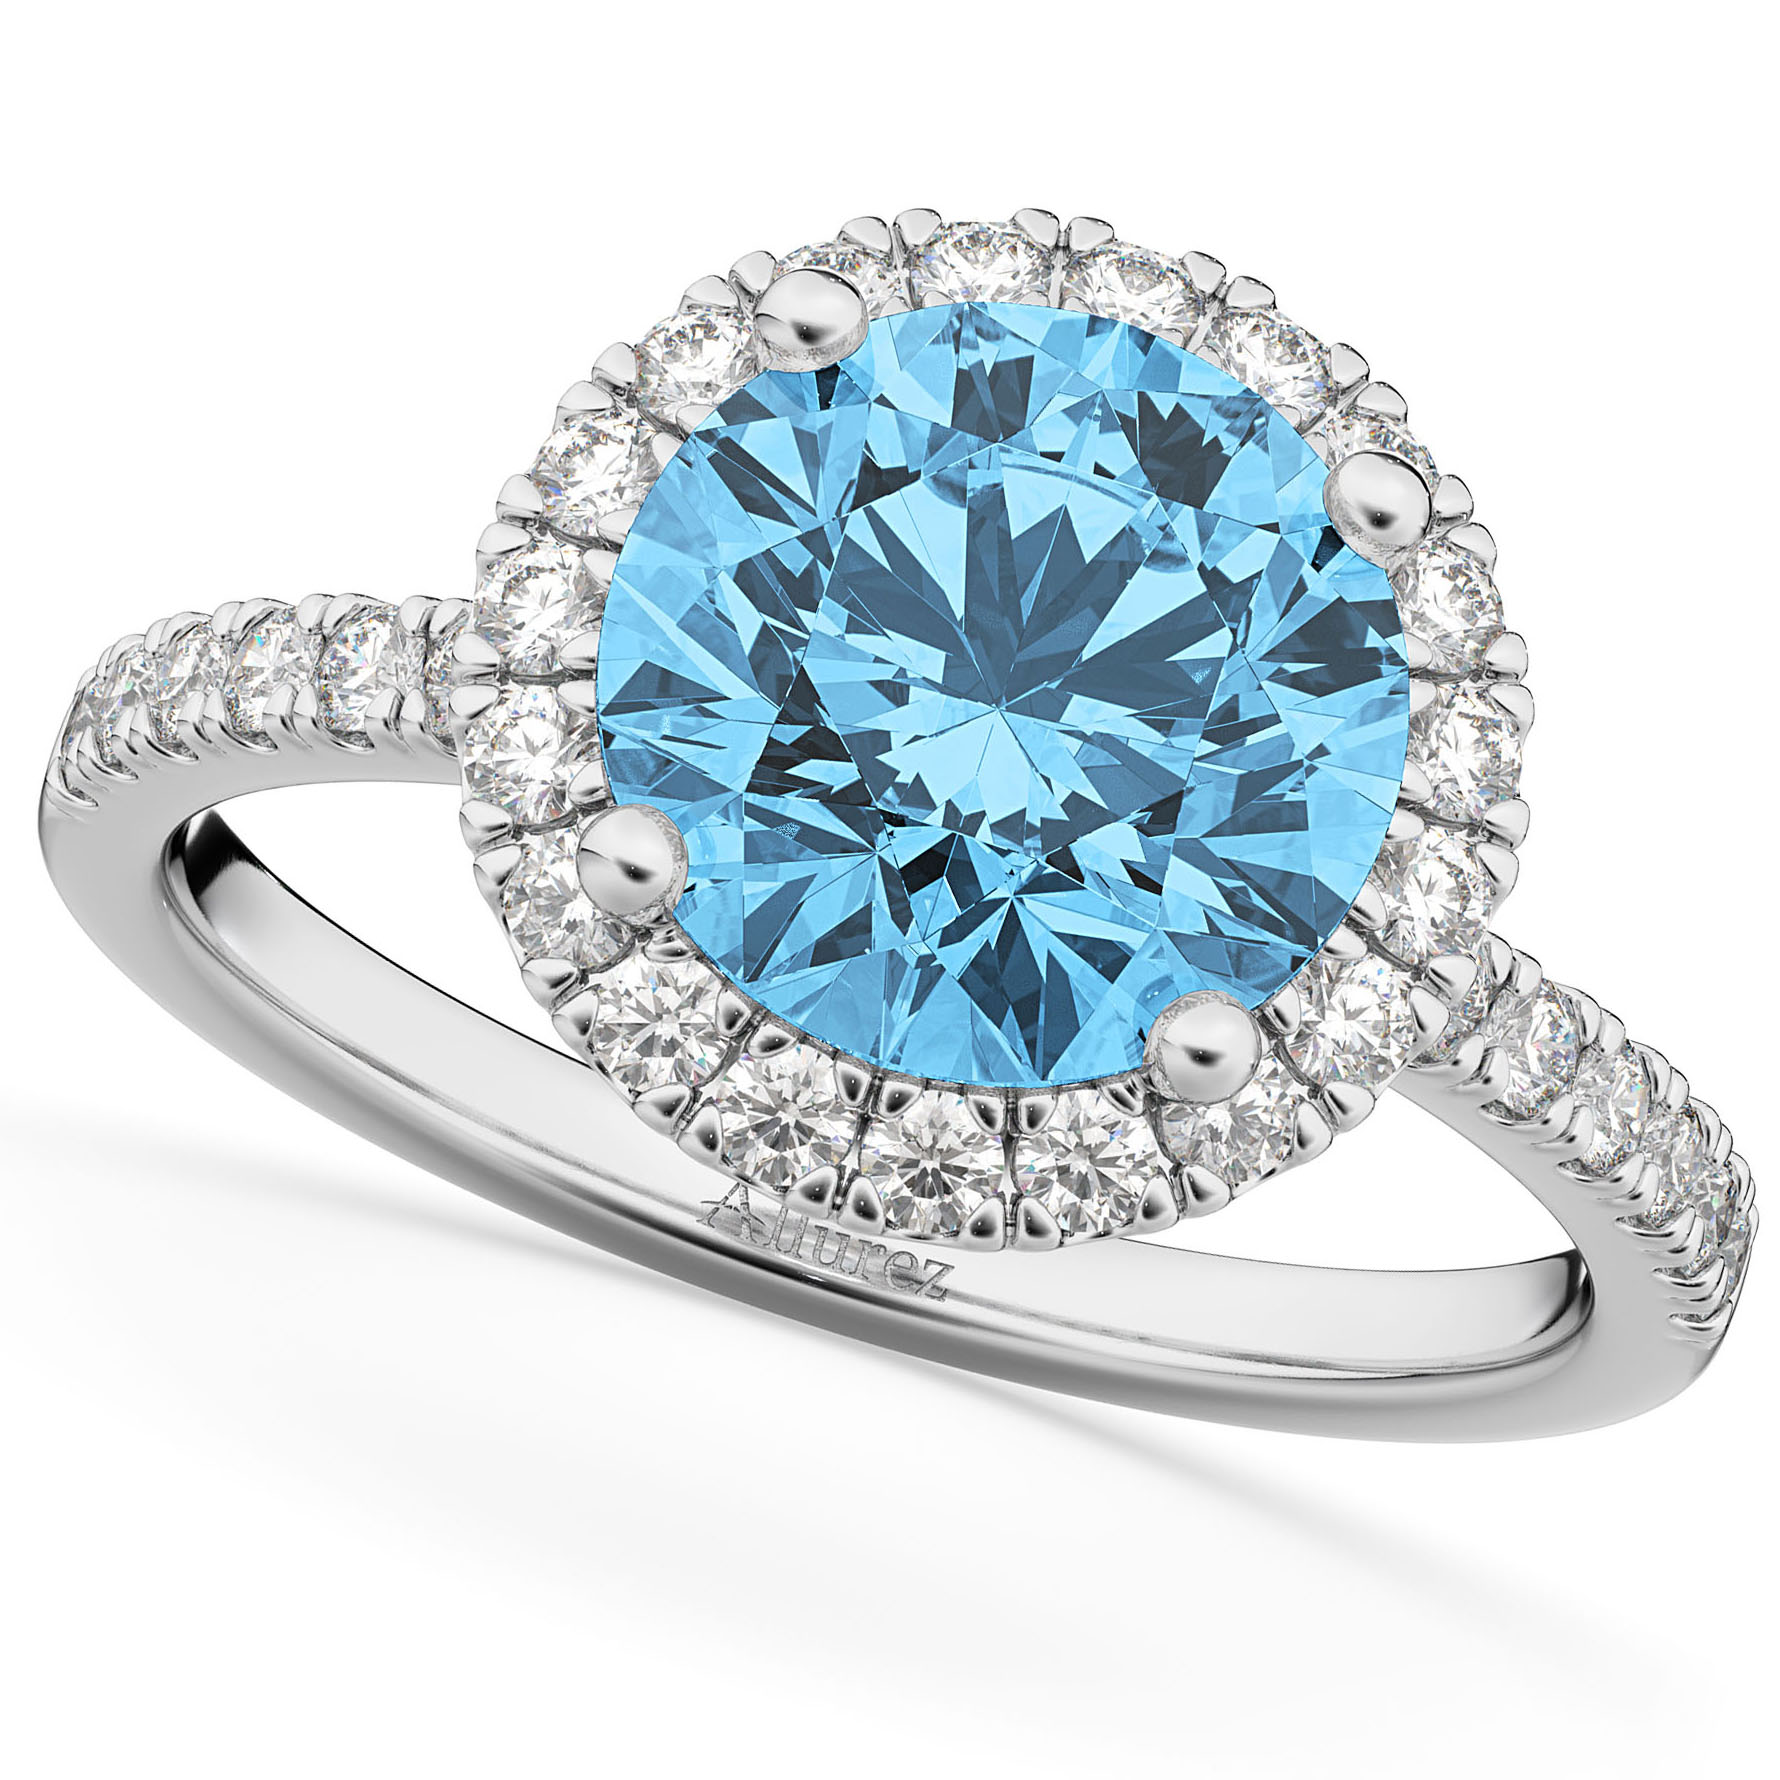 Halo Blue Topaz & Diamond Engagement Ring 18K White Gold 3.00ct